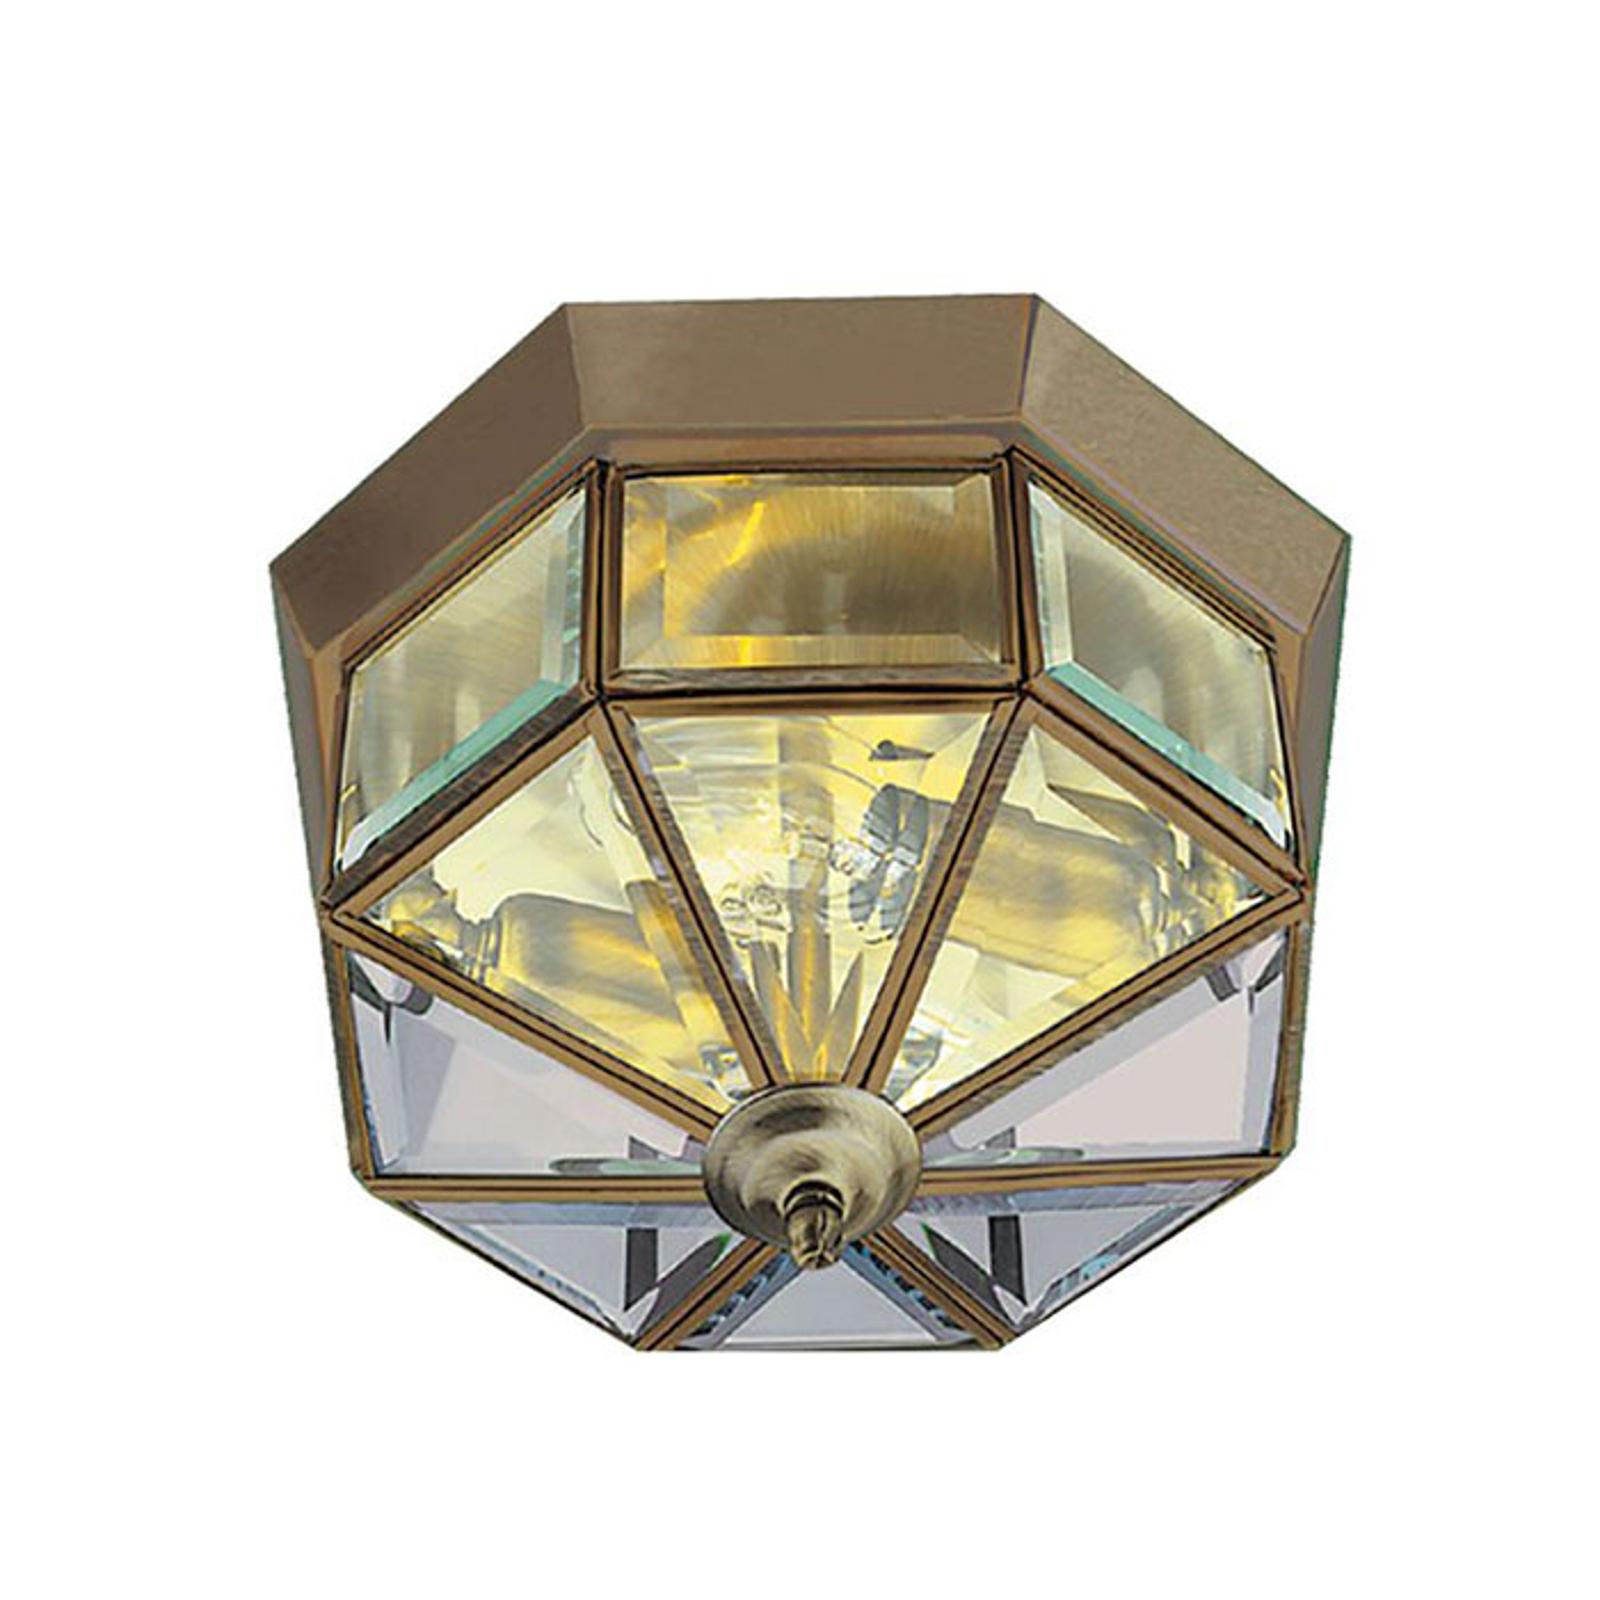 Lampa sufitowa Flush Klassik mosiądz ośmiokątna